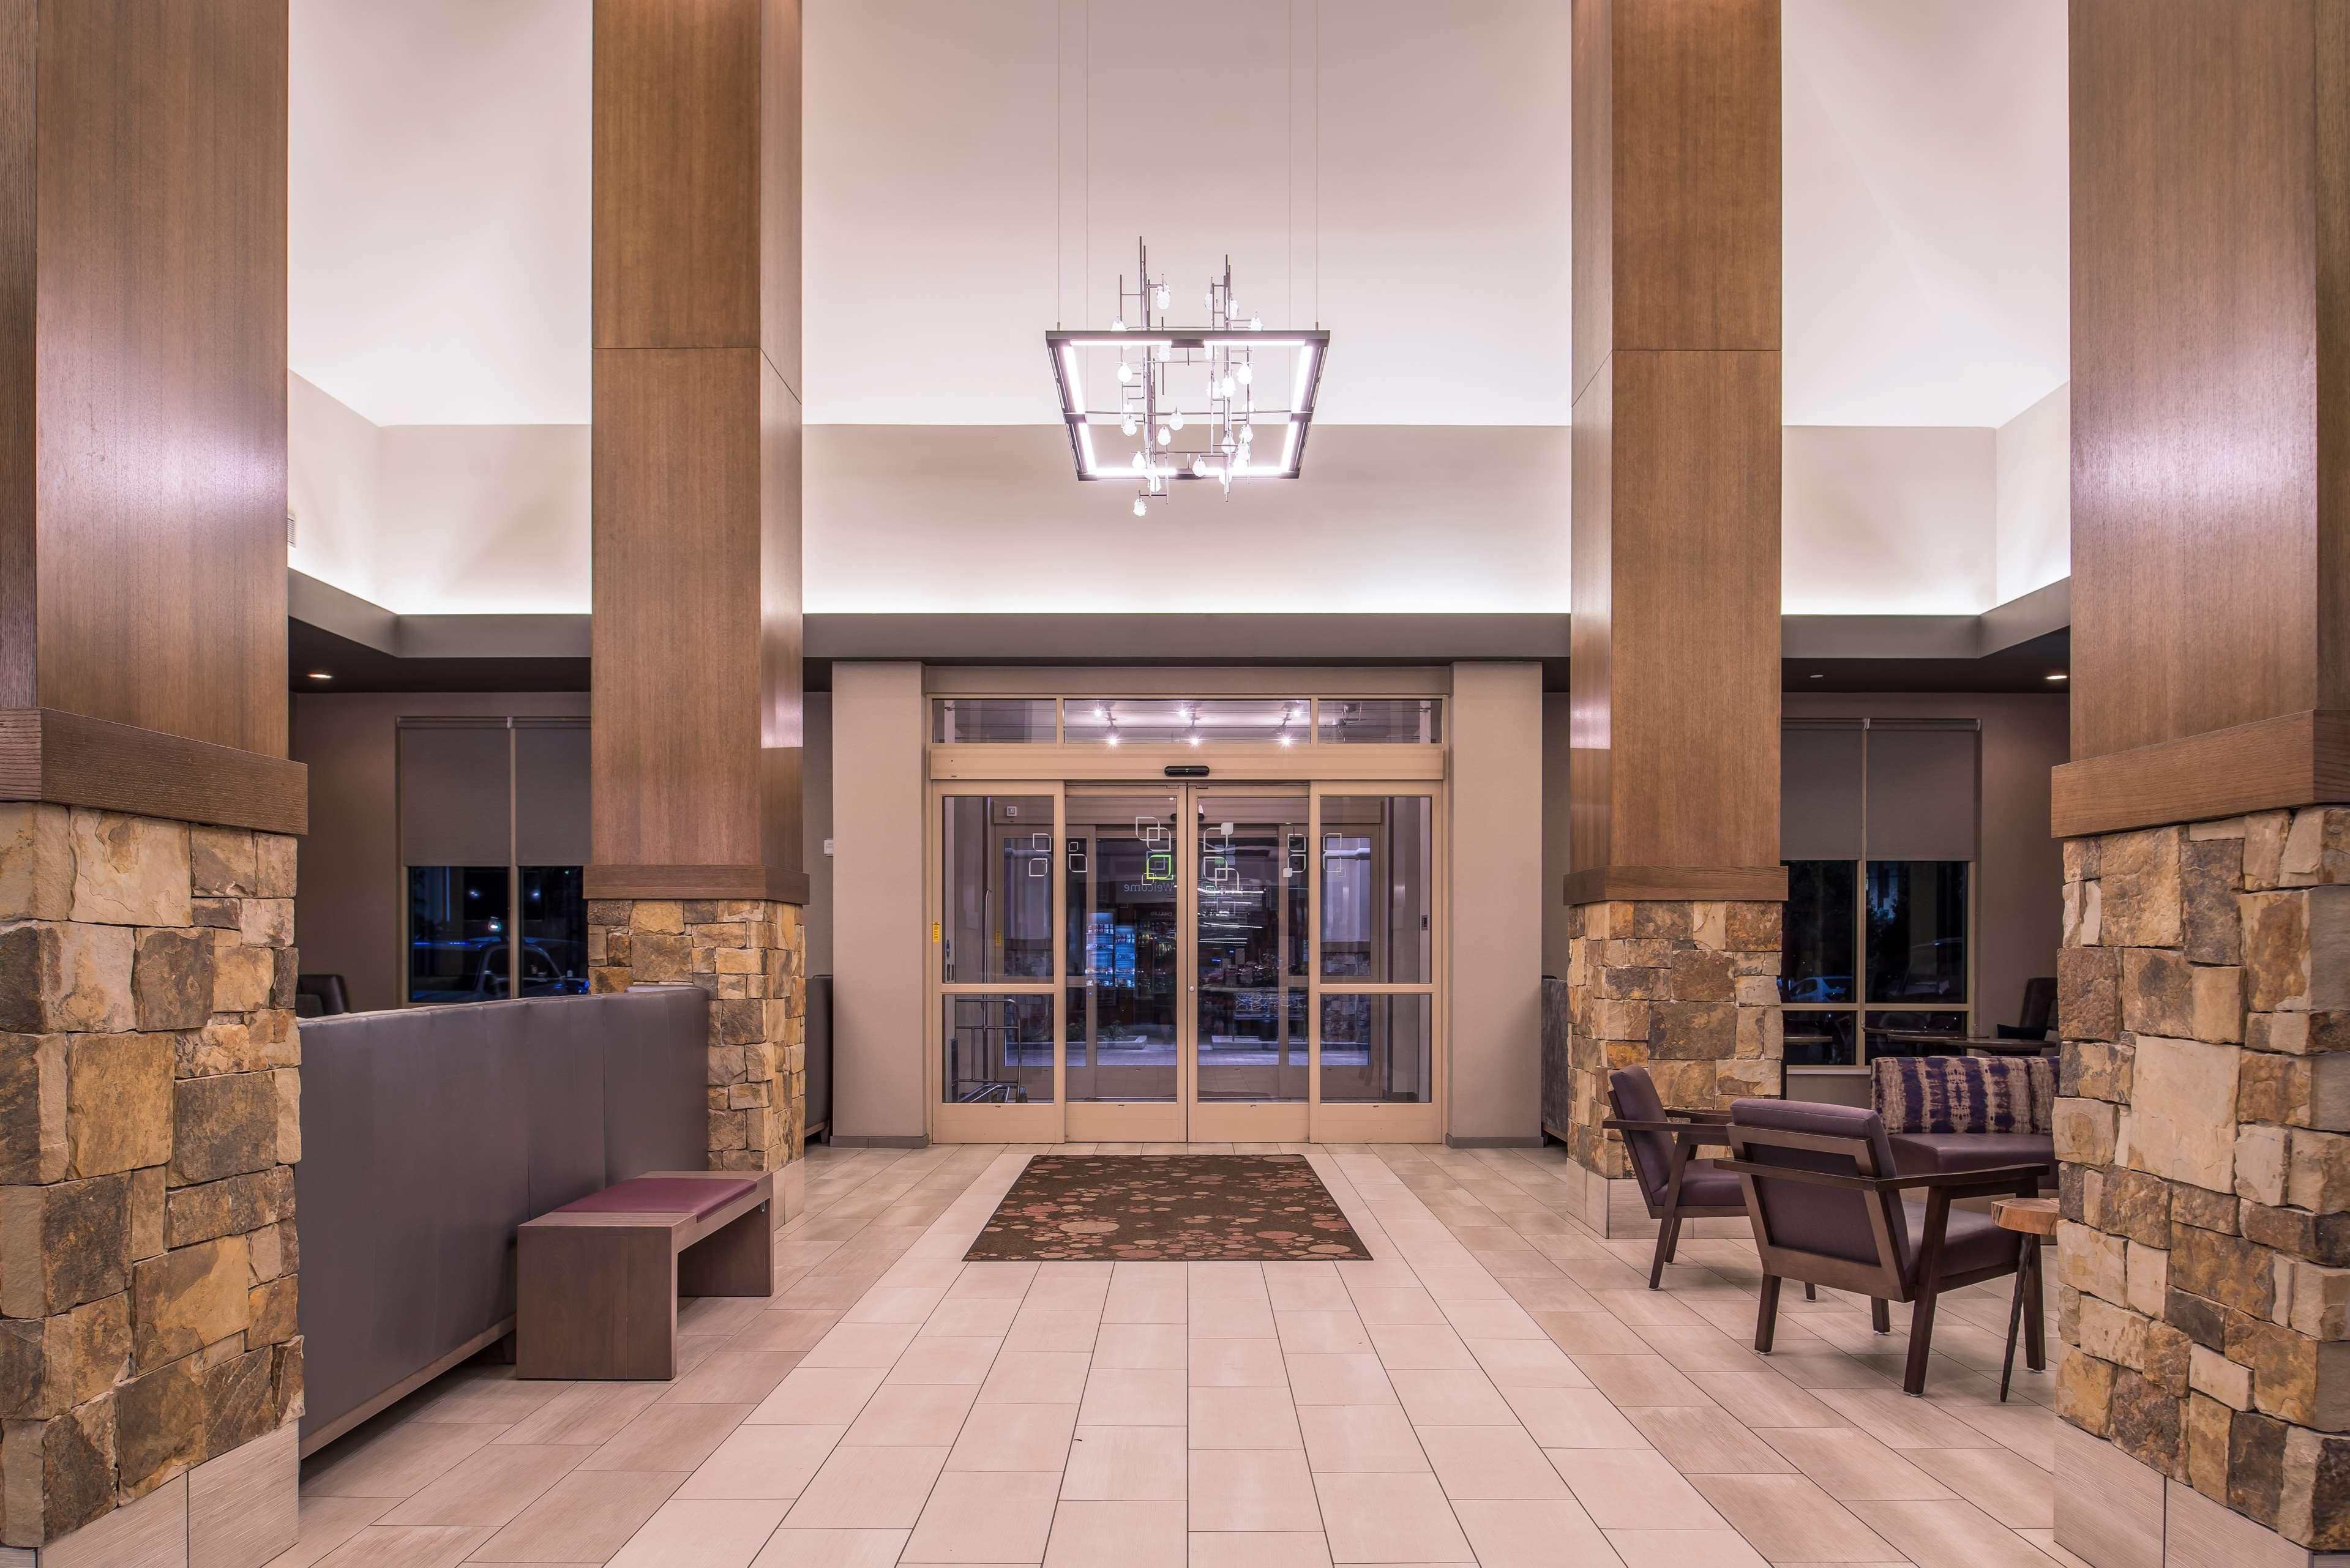 Hilton Garden Inn Salt Lake City Downtown image 9